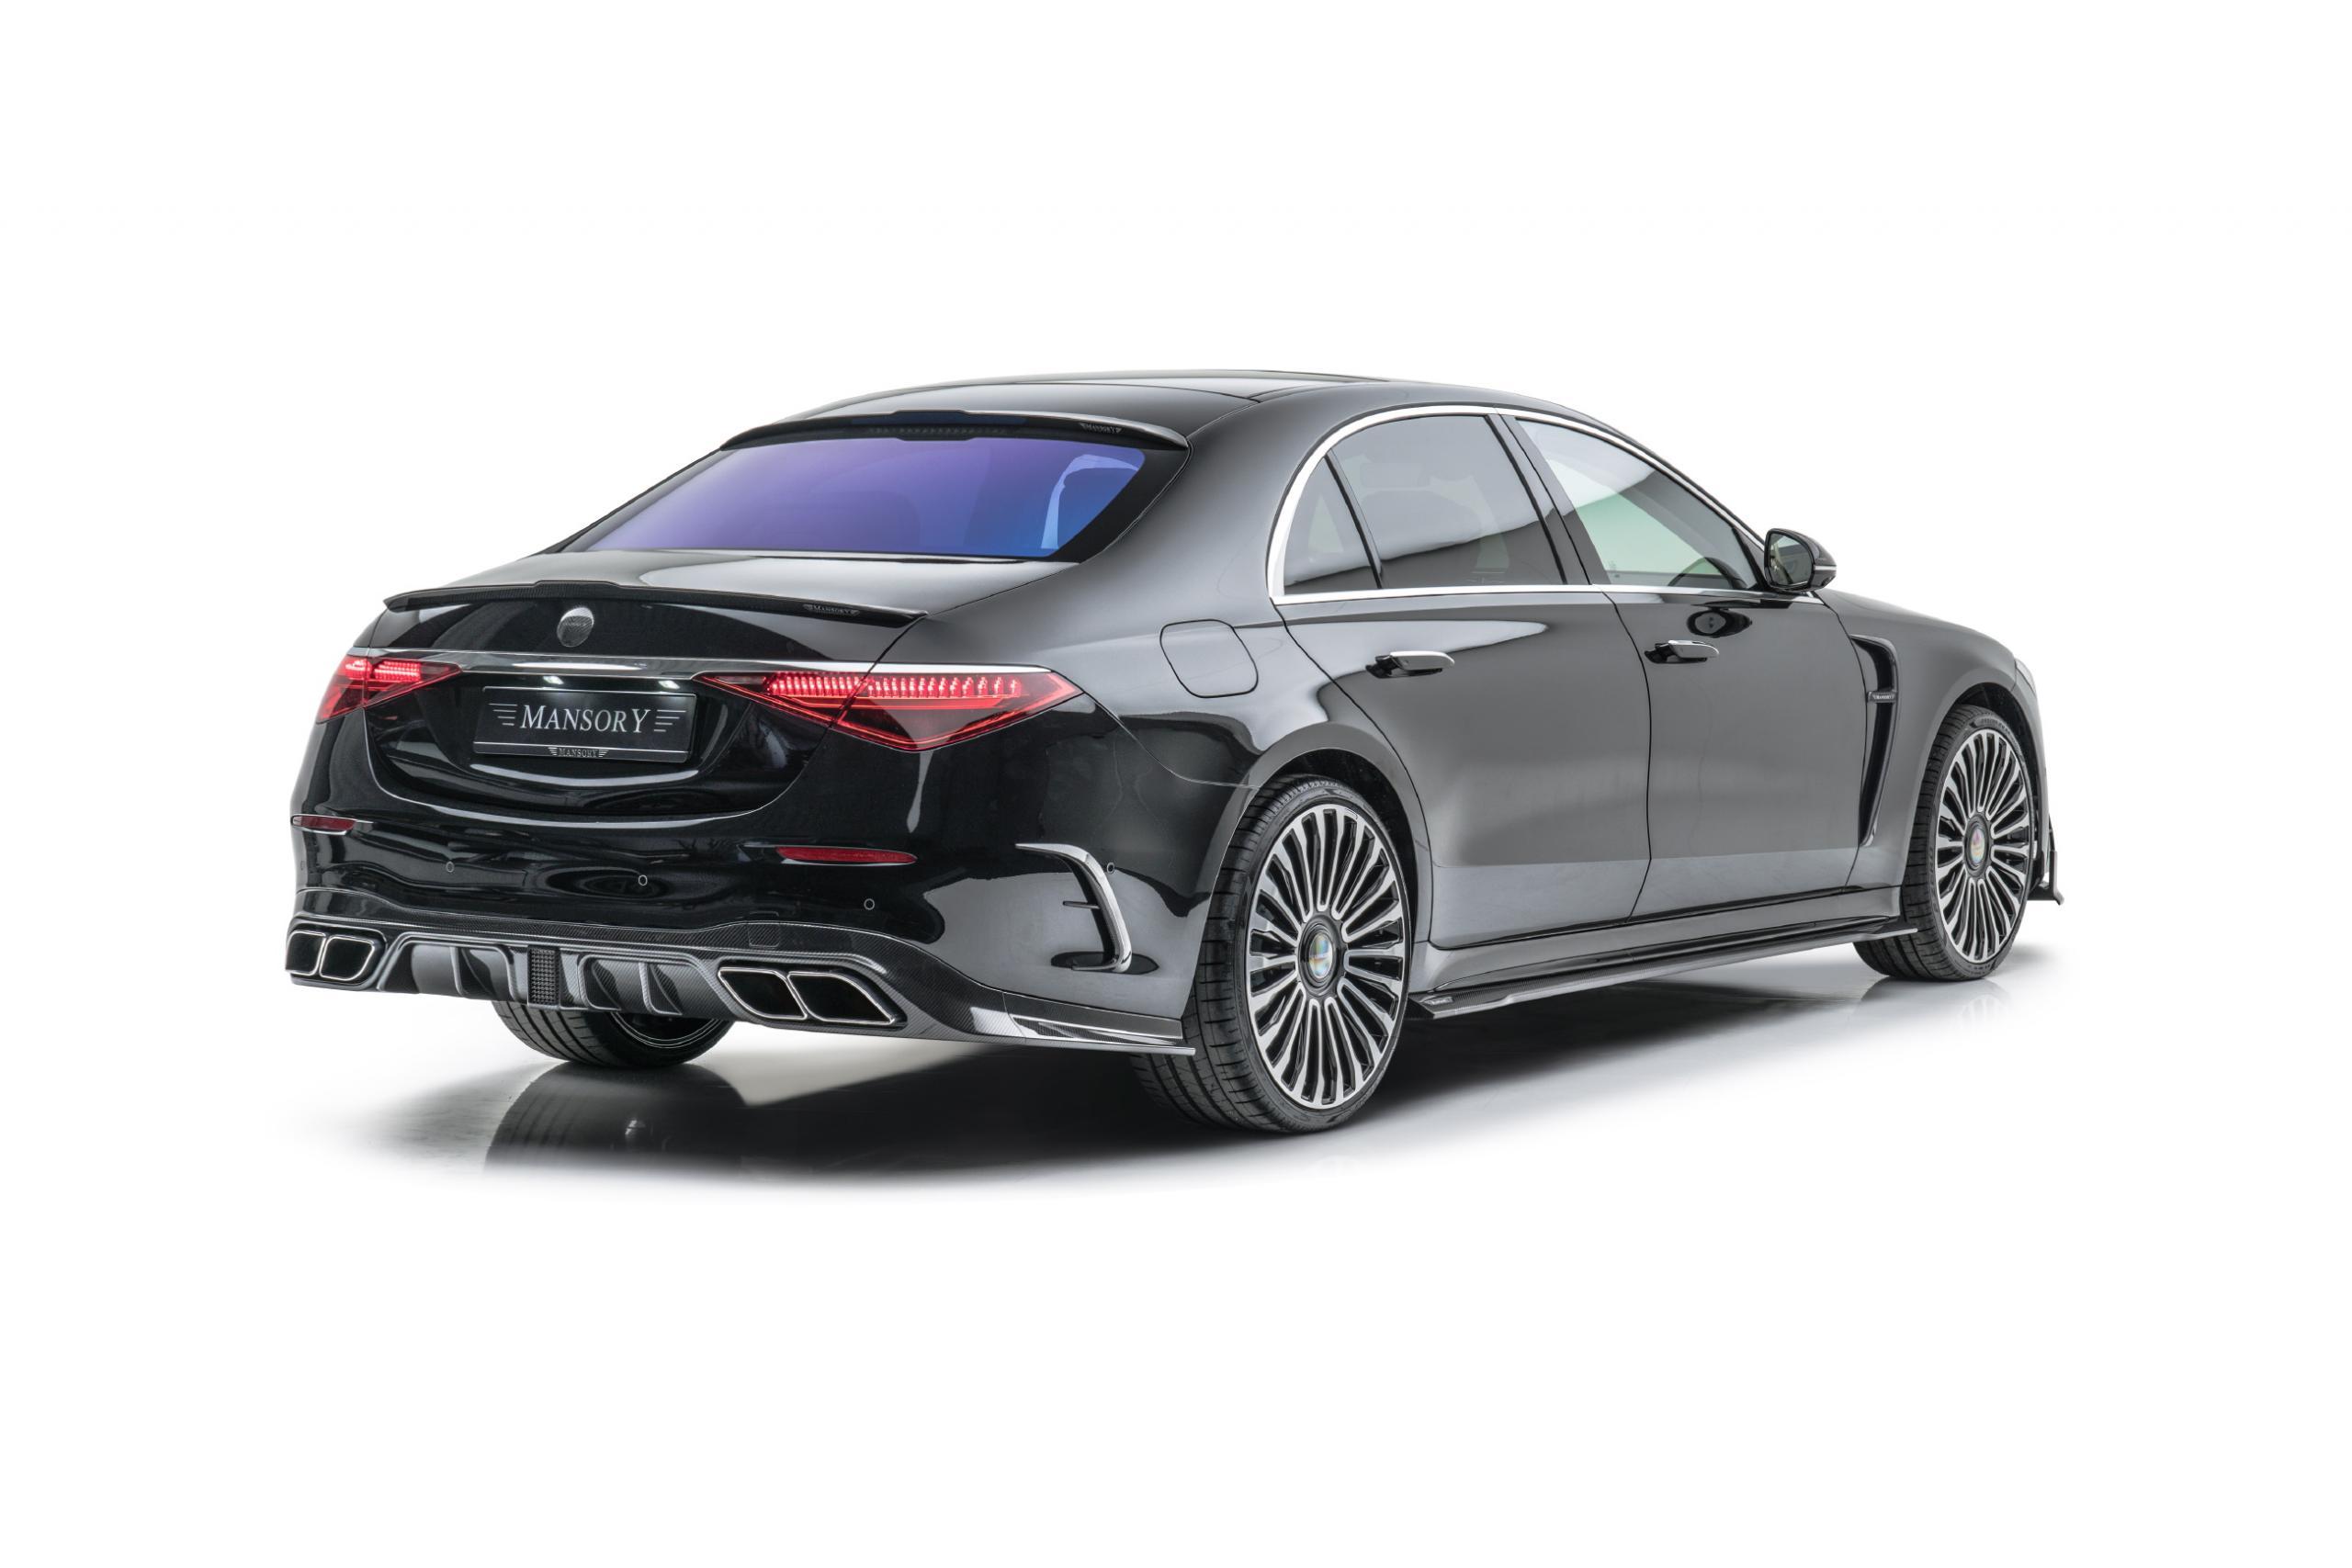 mansory w223 mercedes s class body kit carbon fiber rear apron trunk spoiler rear bumper air outtake roof spoiler cs11 22 wheel 2021 2022 2023